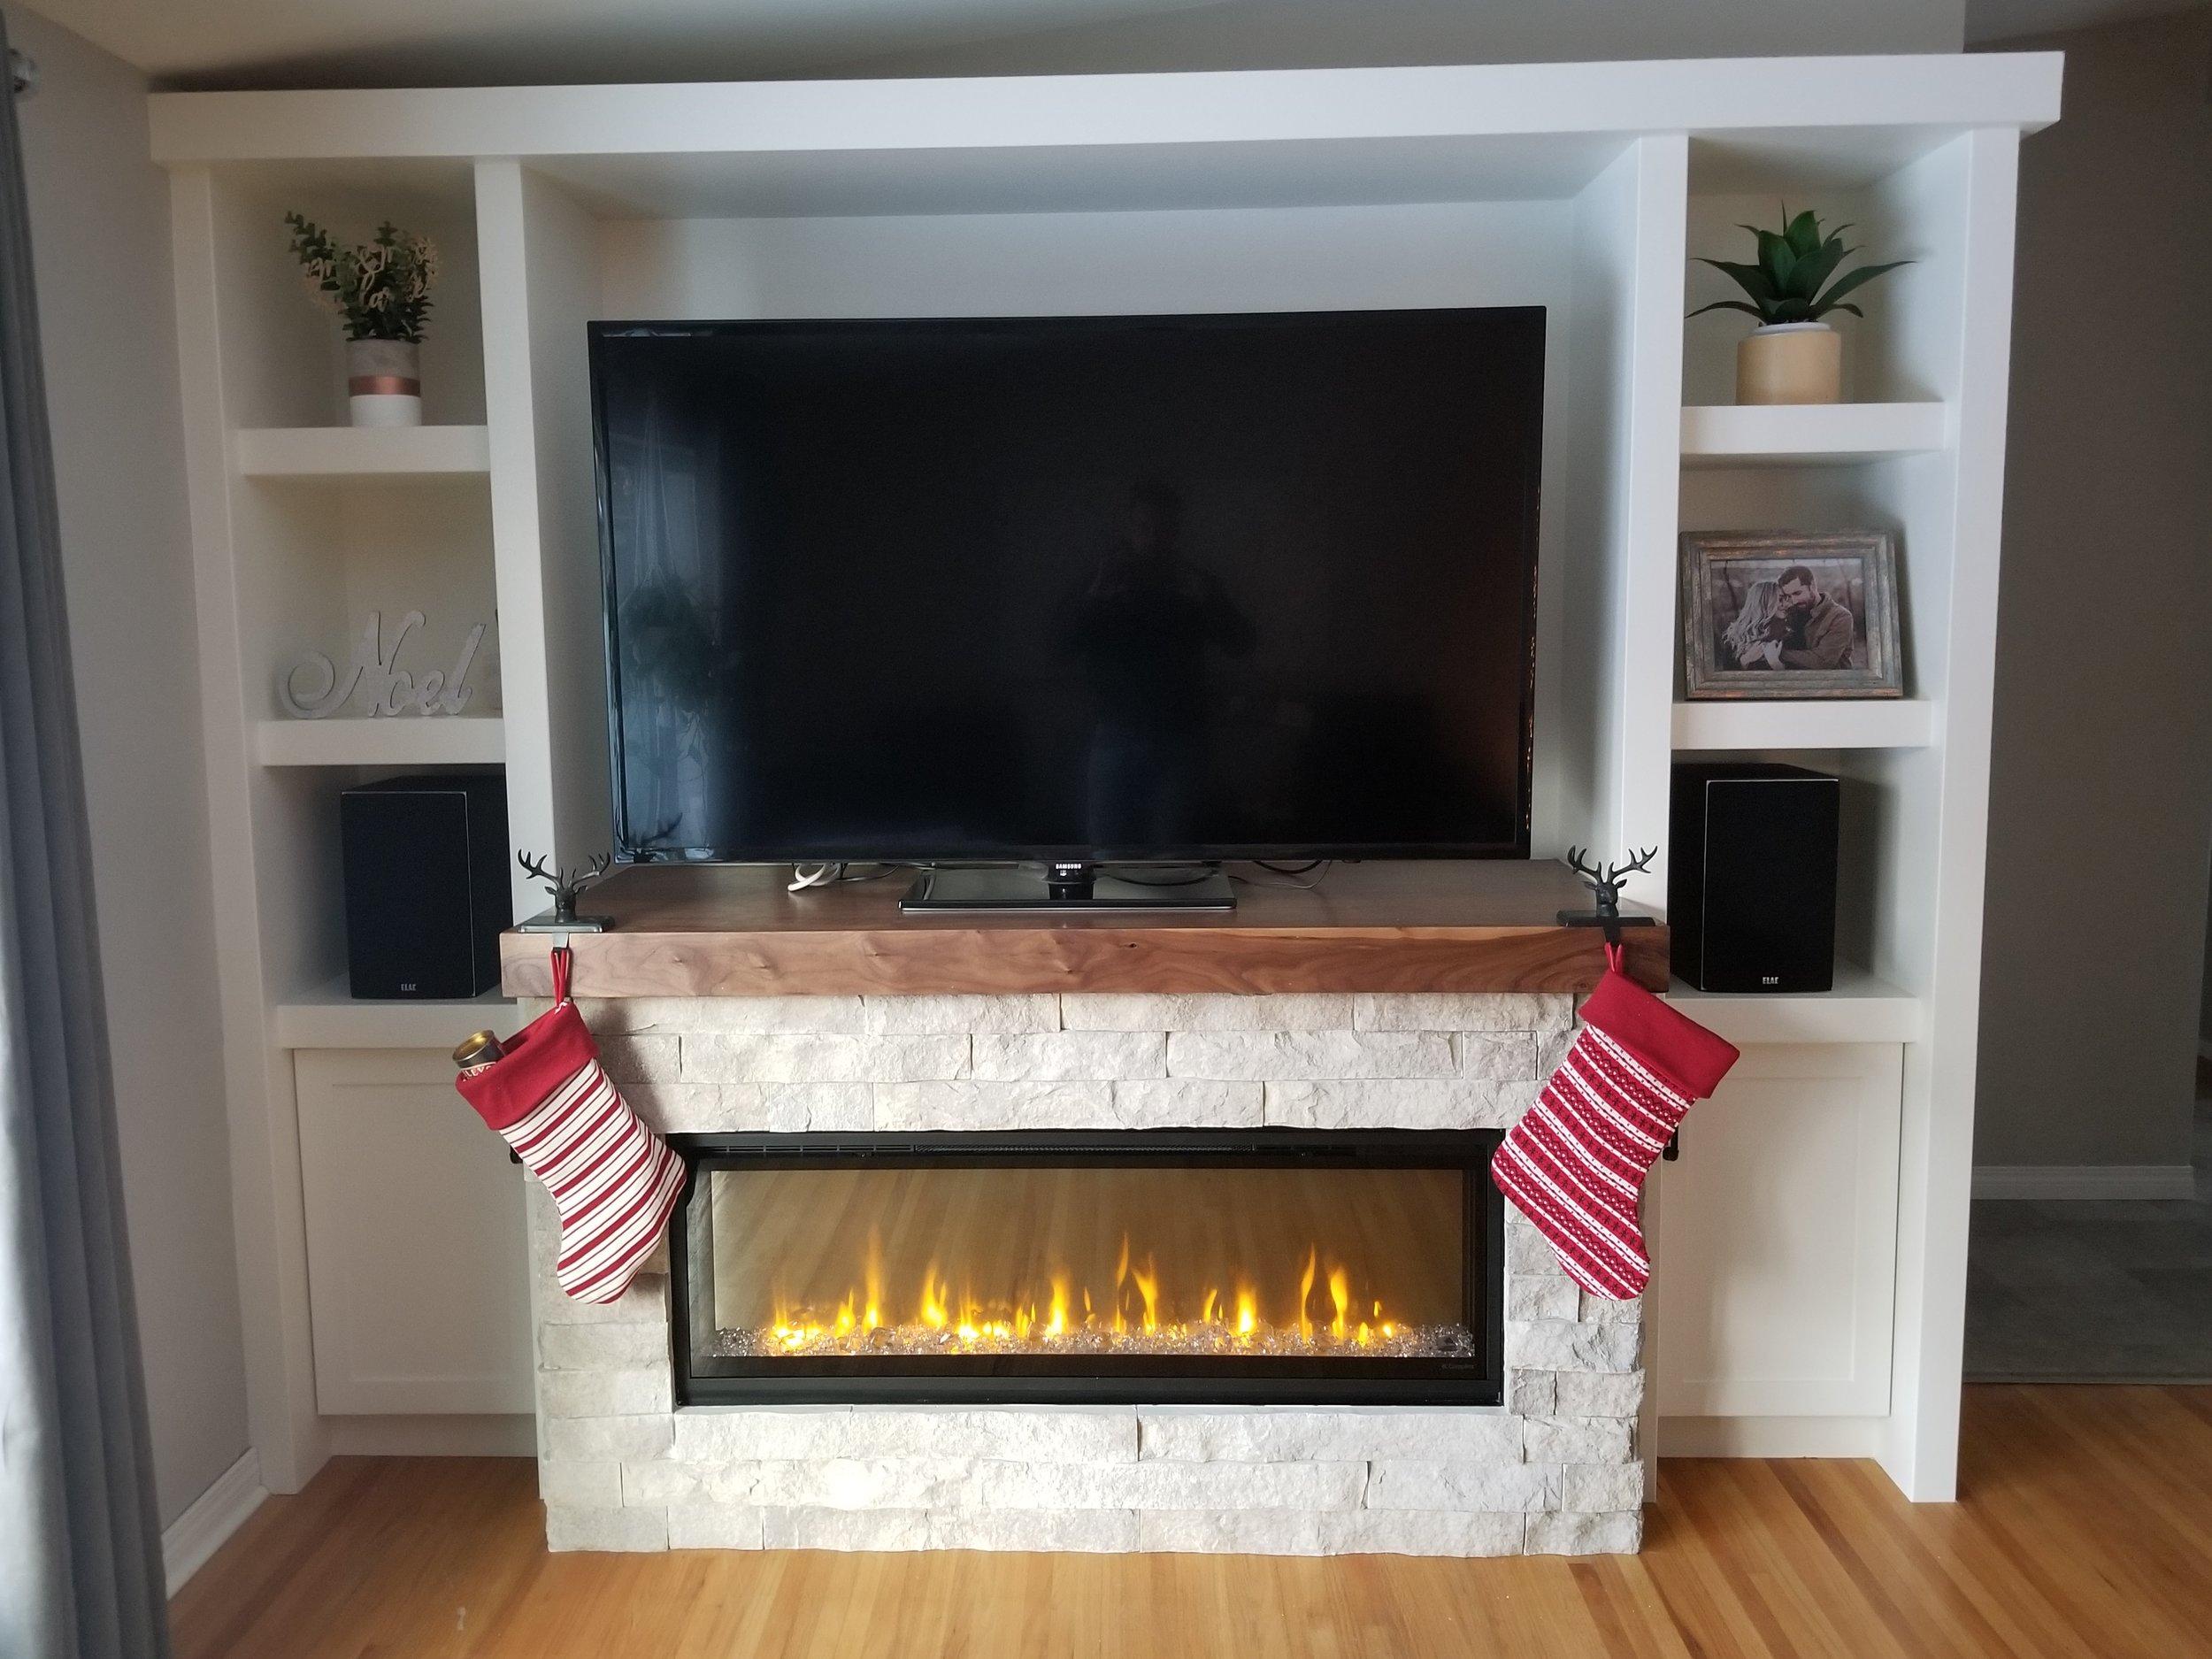 Fireplace Mantel/Built-ins